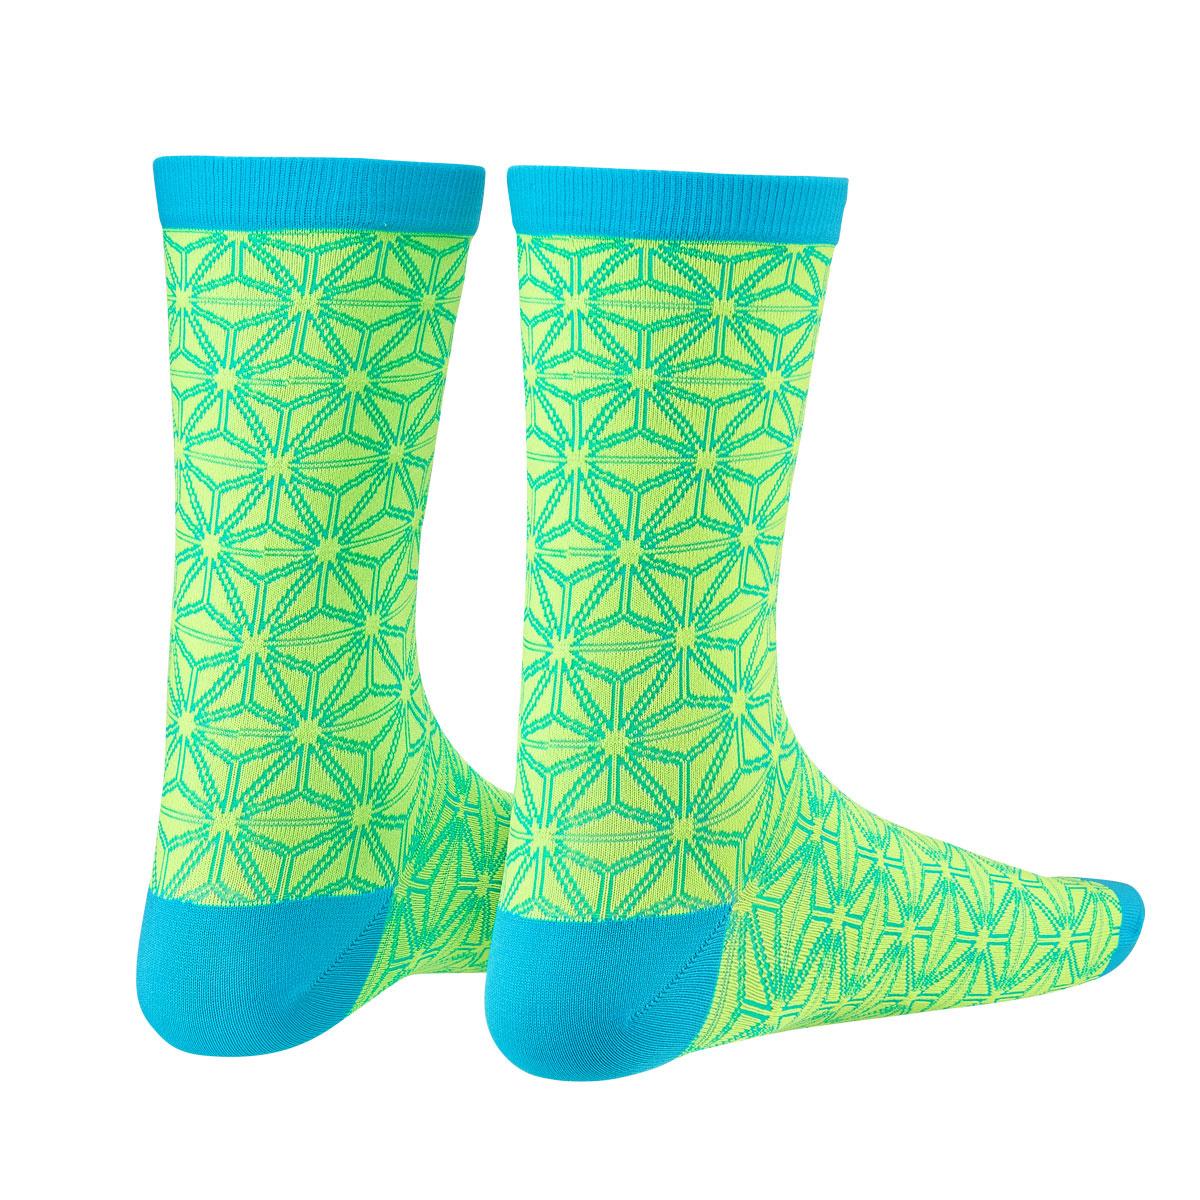 Supacaz Asanoah Socks